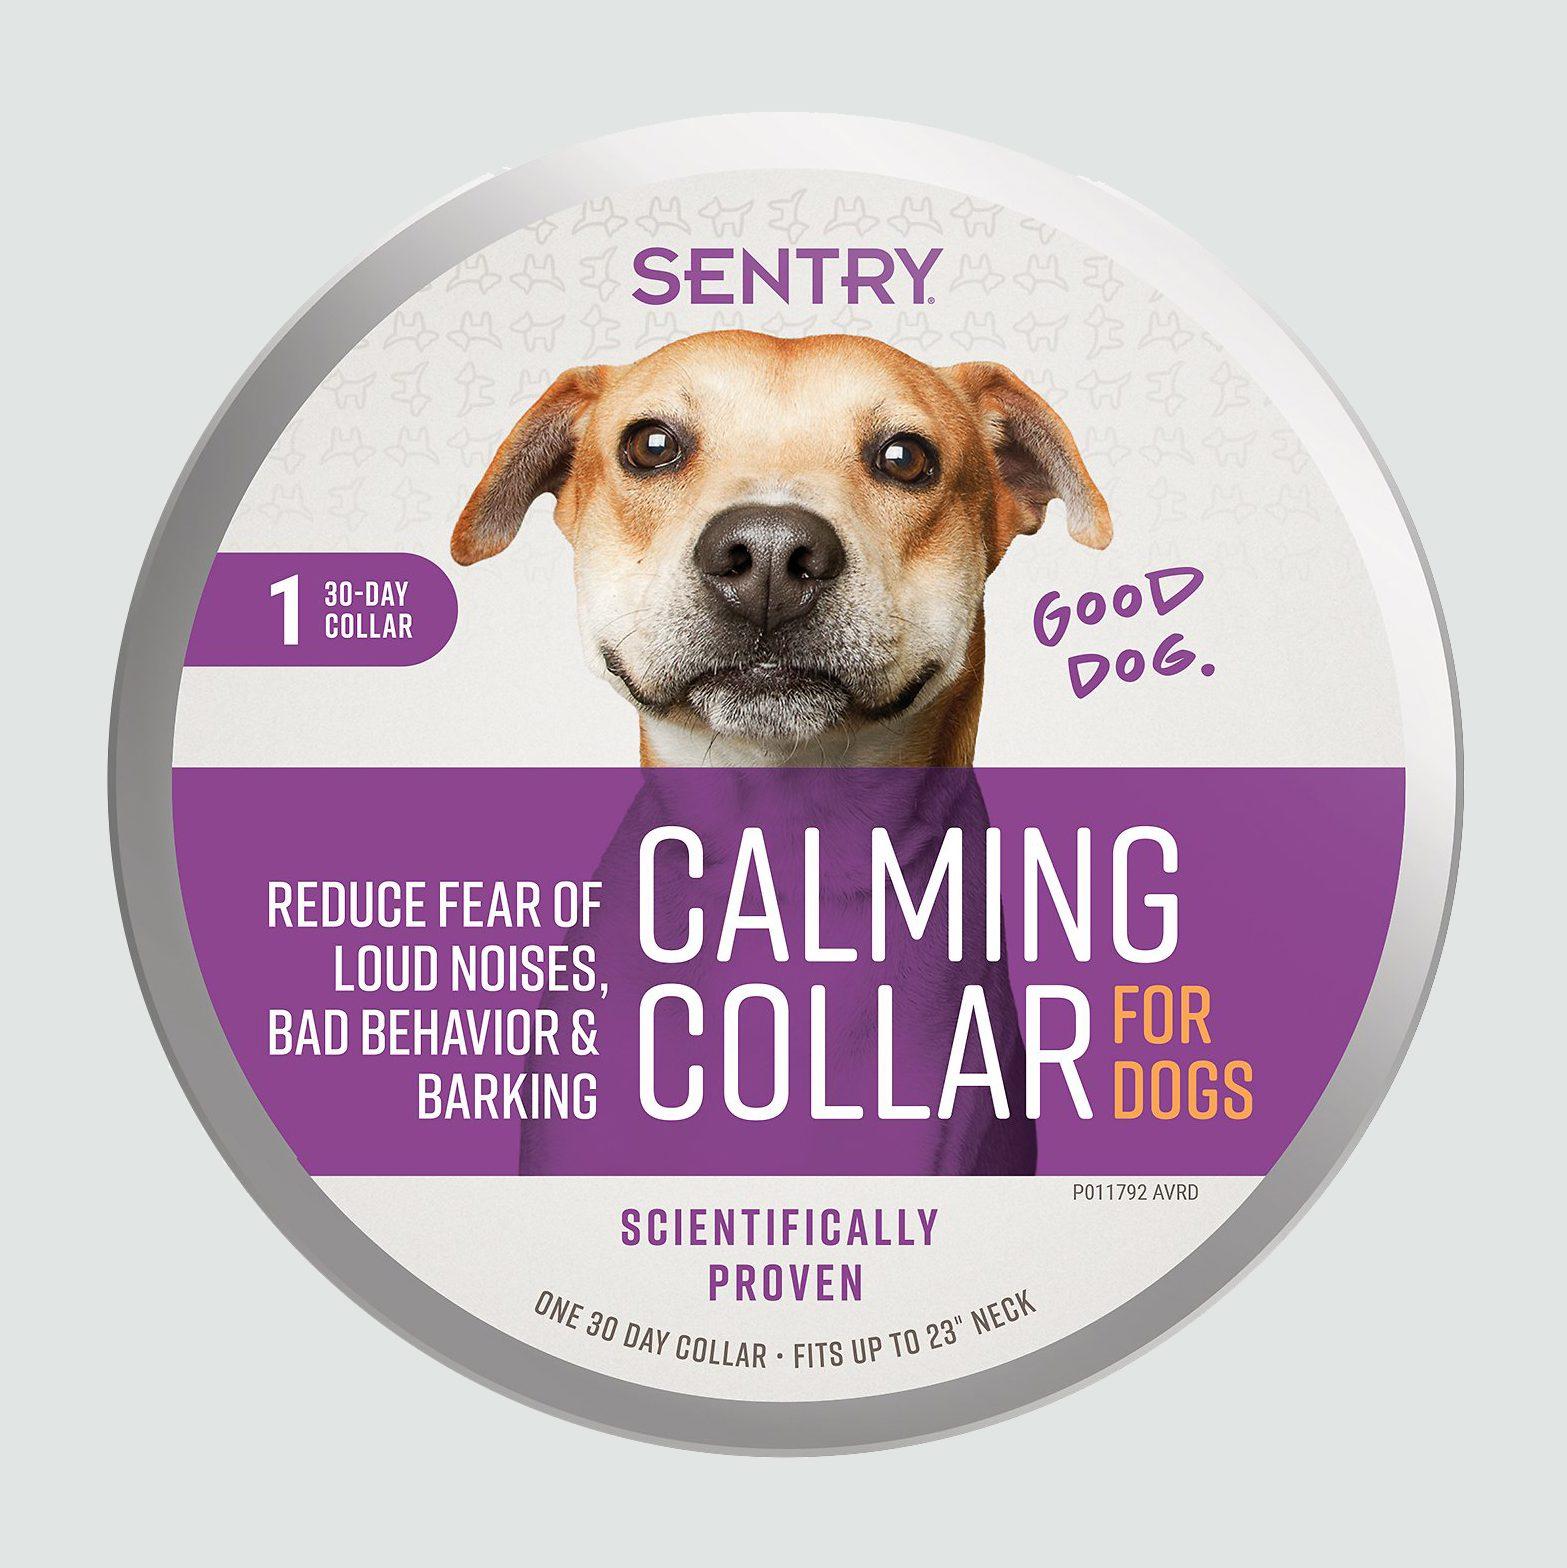 Sentry HC Good Behavior Pheromone Dog Calming Collar